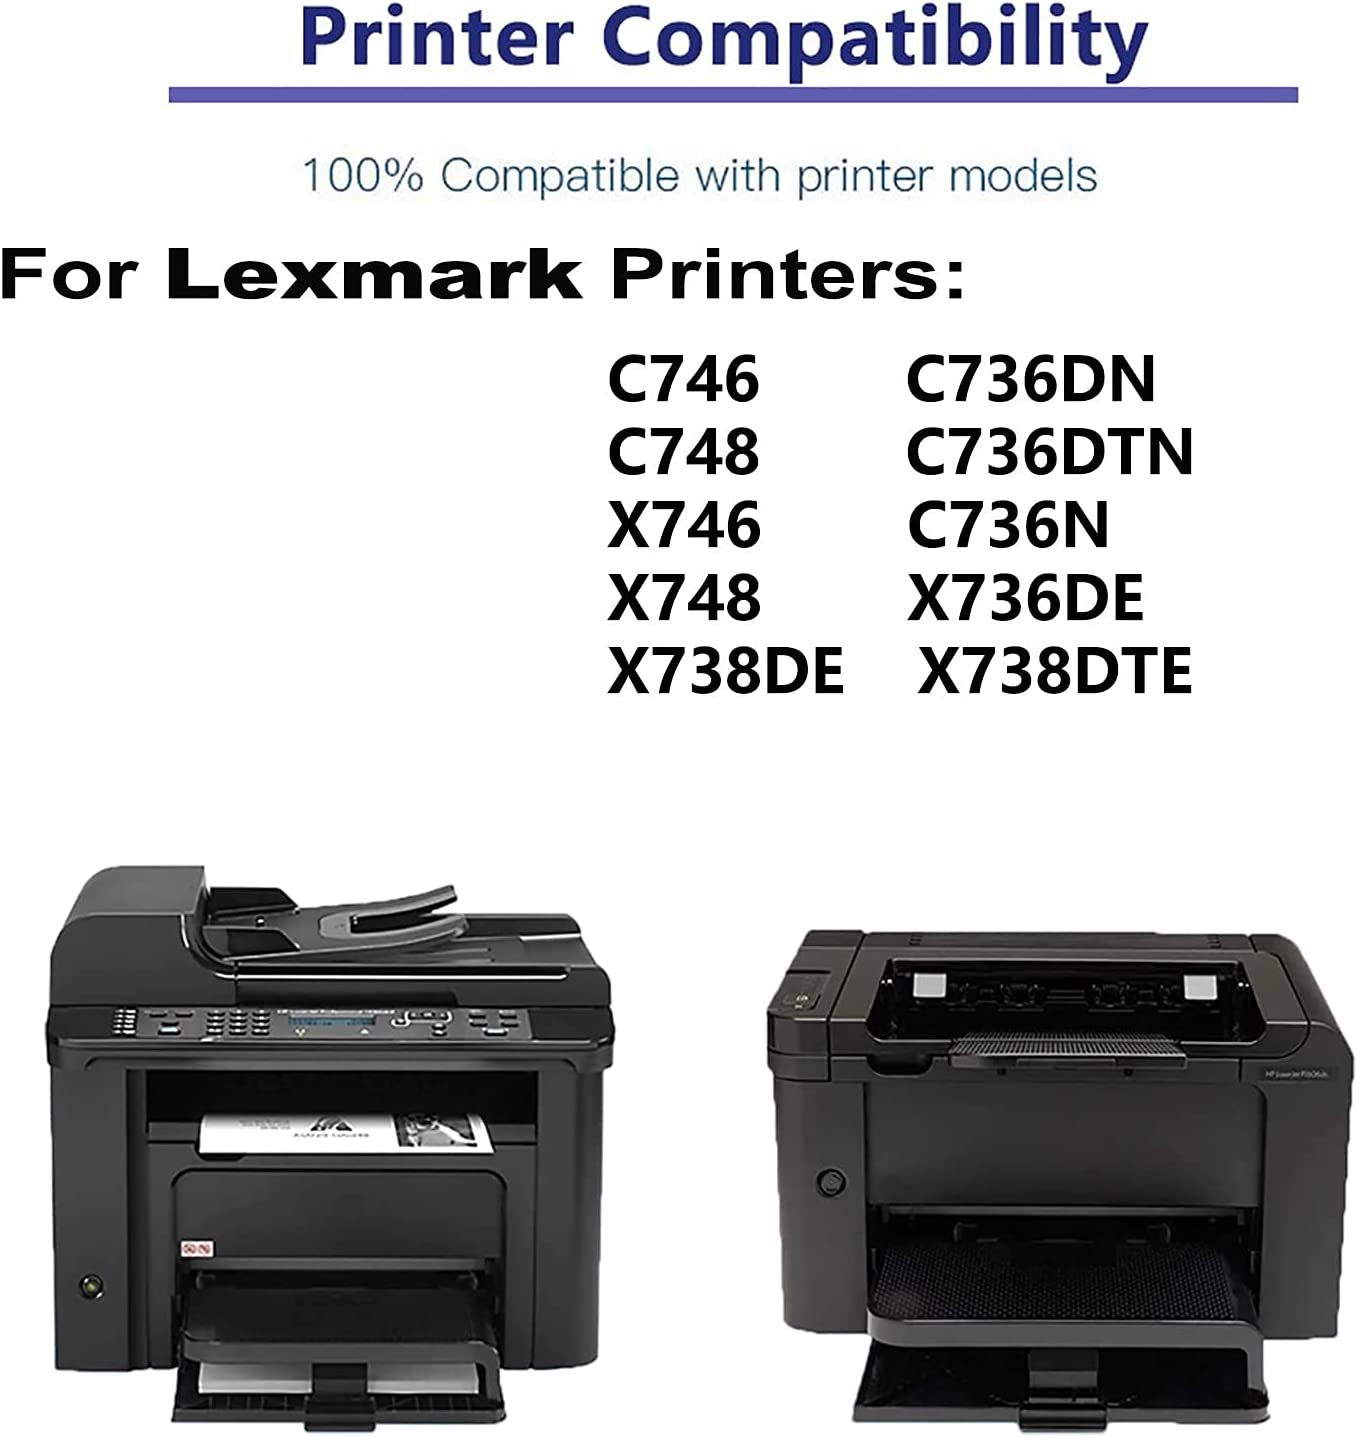 1-Pack (Magenta) Compatible C736DN, C736DTN, C736N Printer Toner Cartridge High Capacity Replacement for Lexmark C736H2MG Toner Cartridge